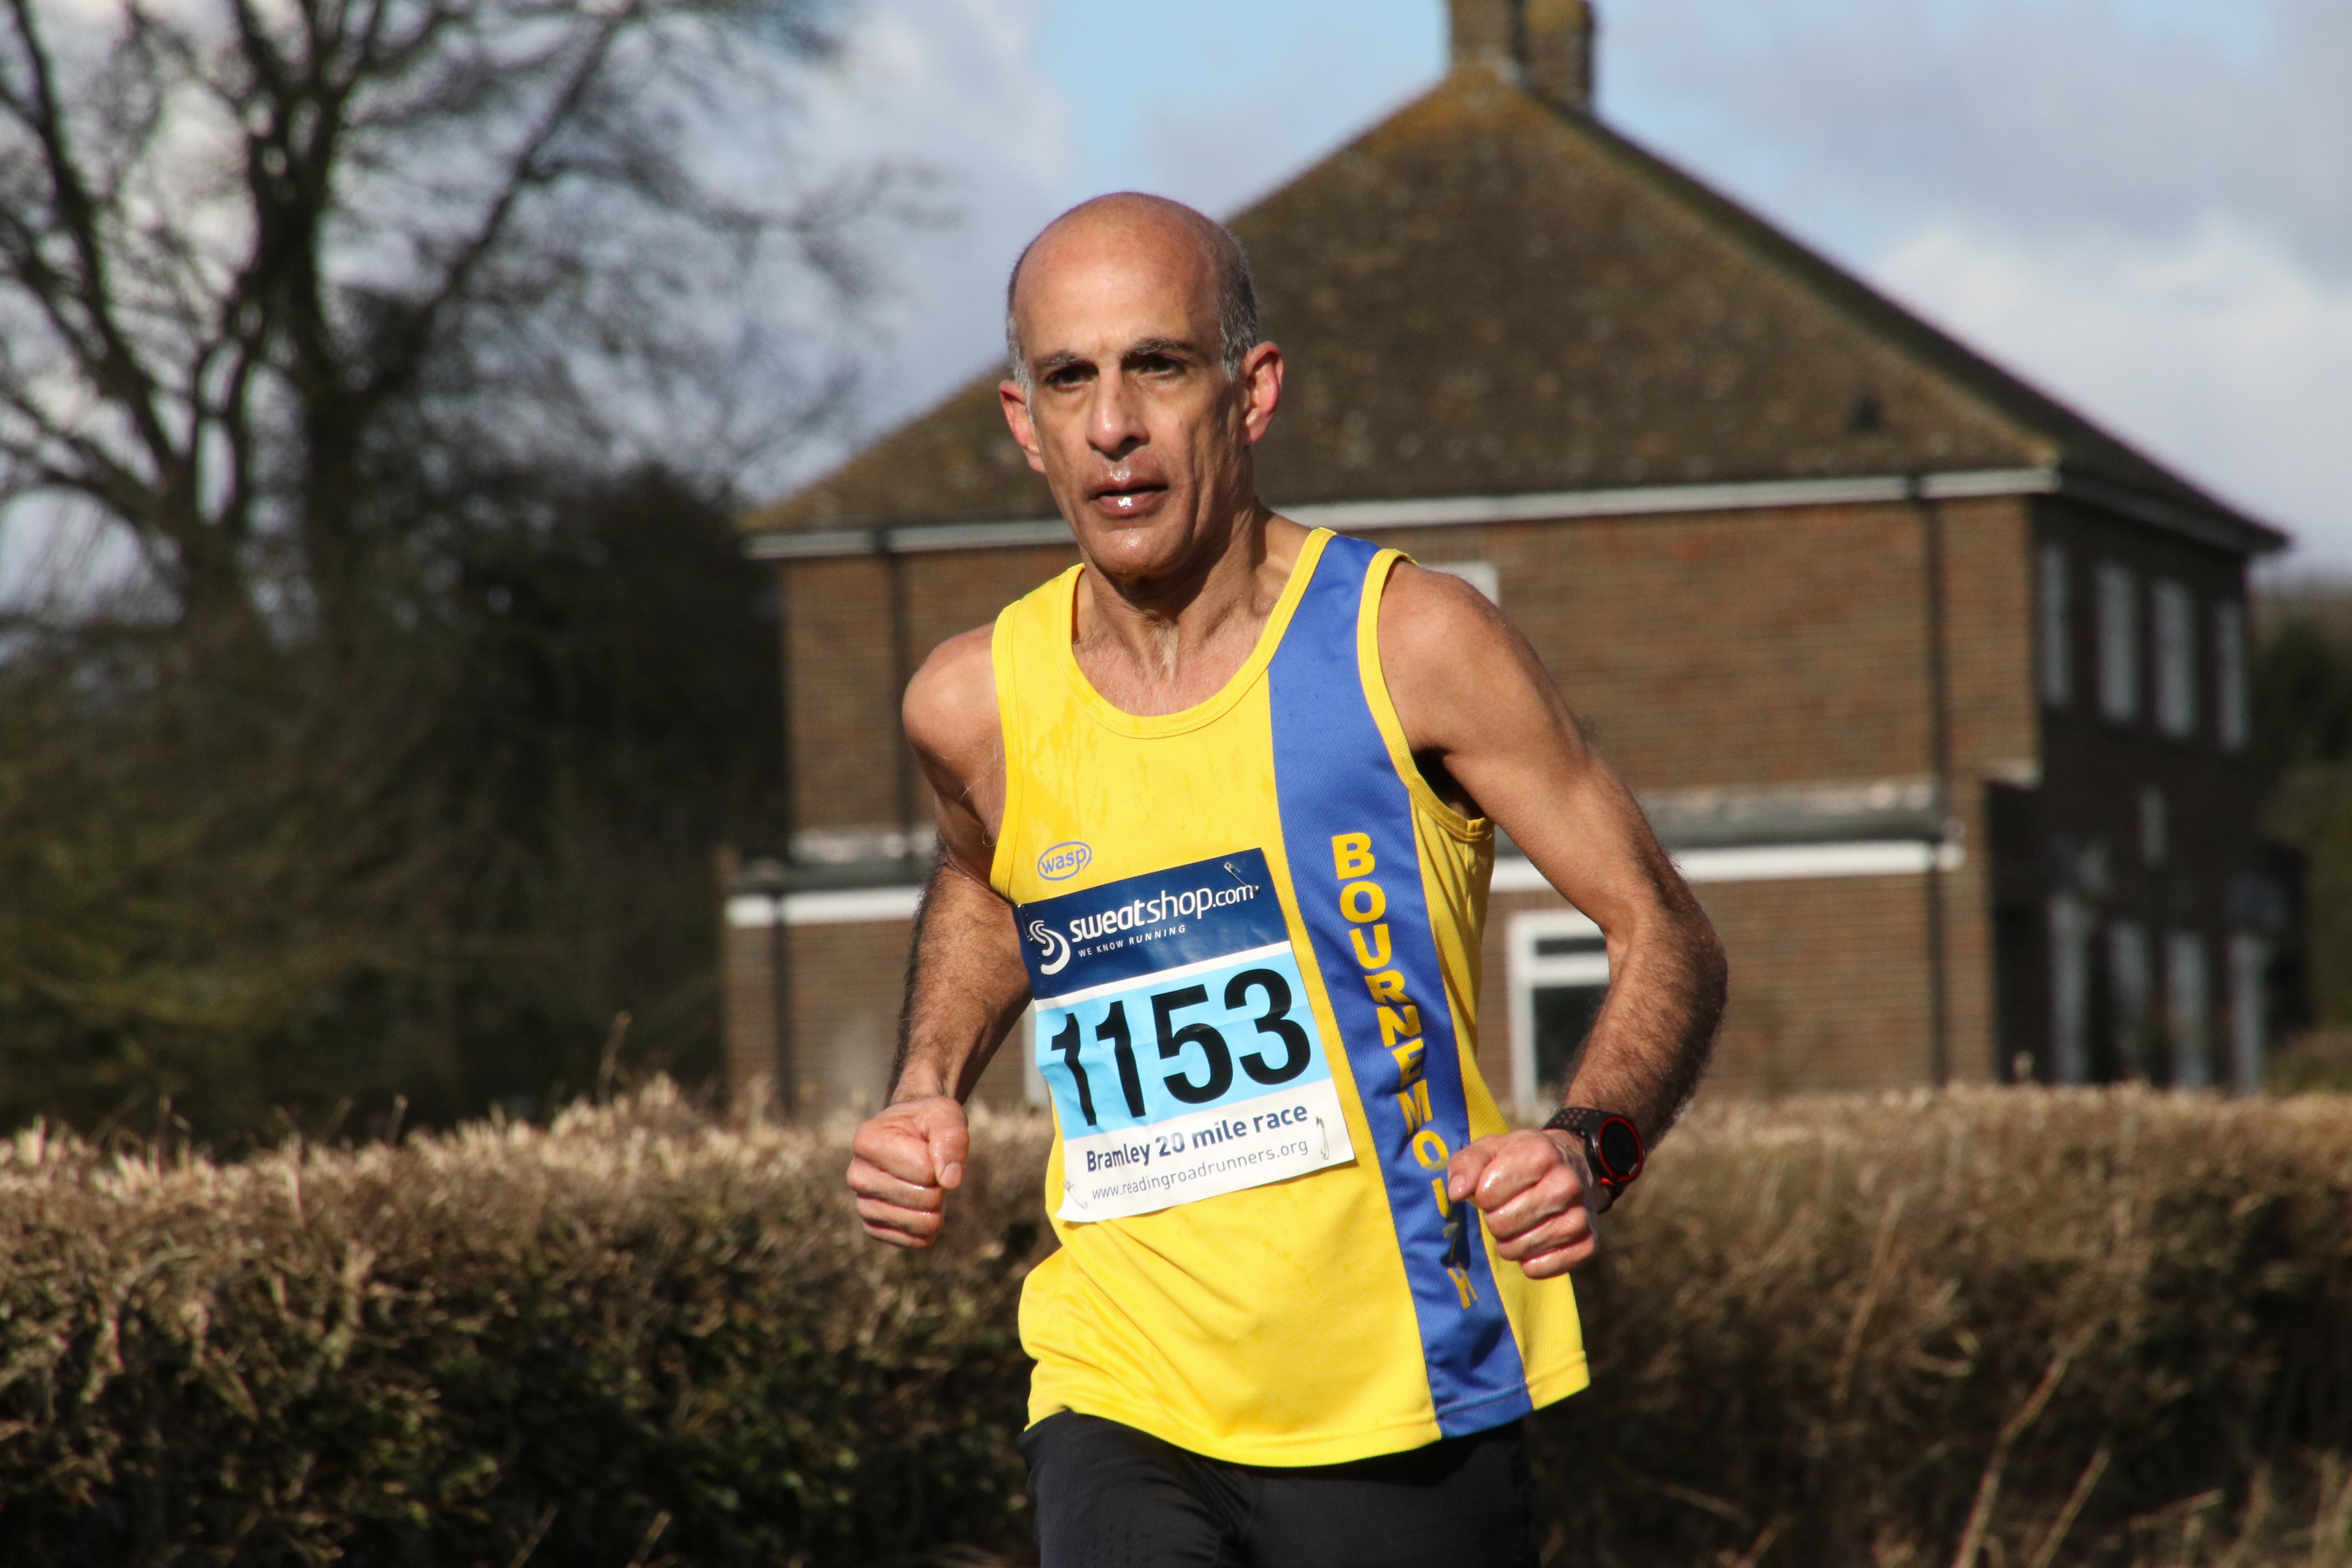 Sanjai Sharma in the Wokingham Half Marathon